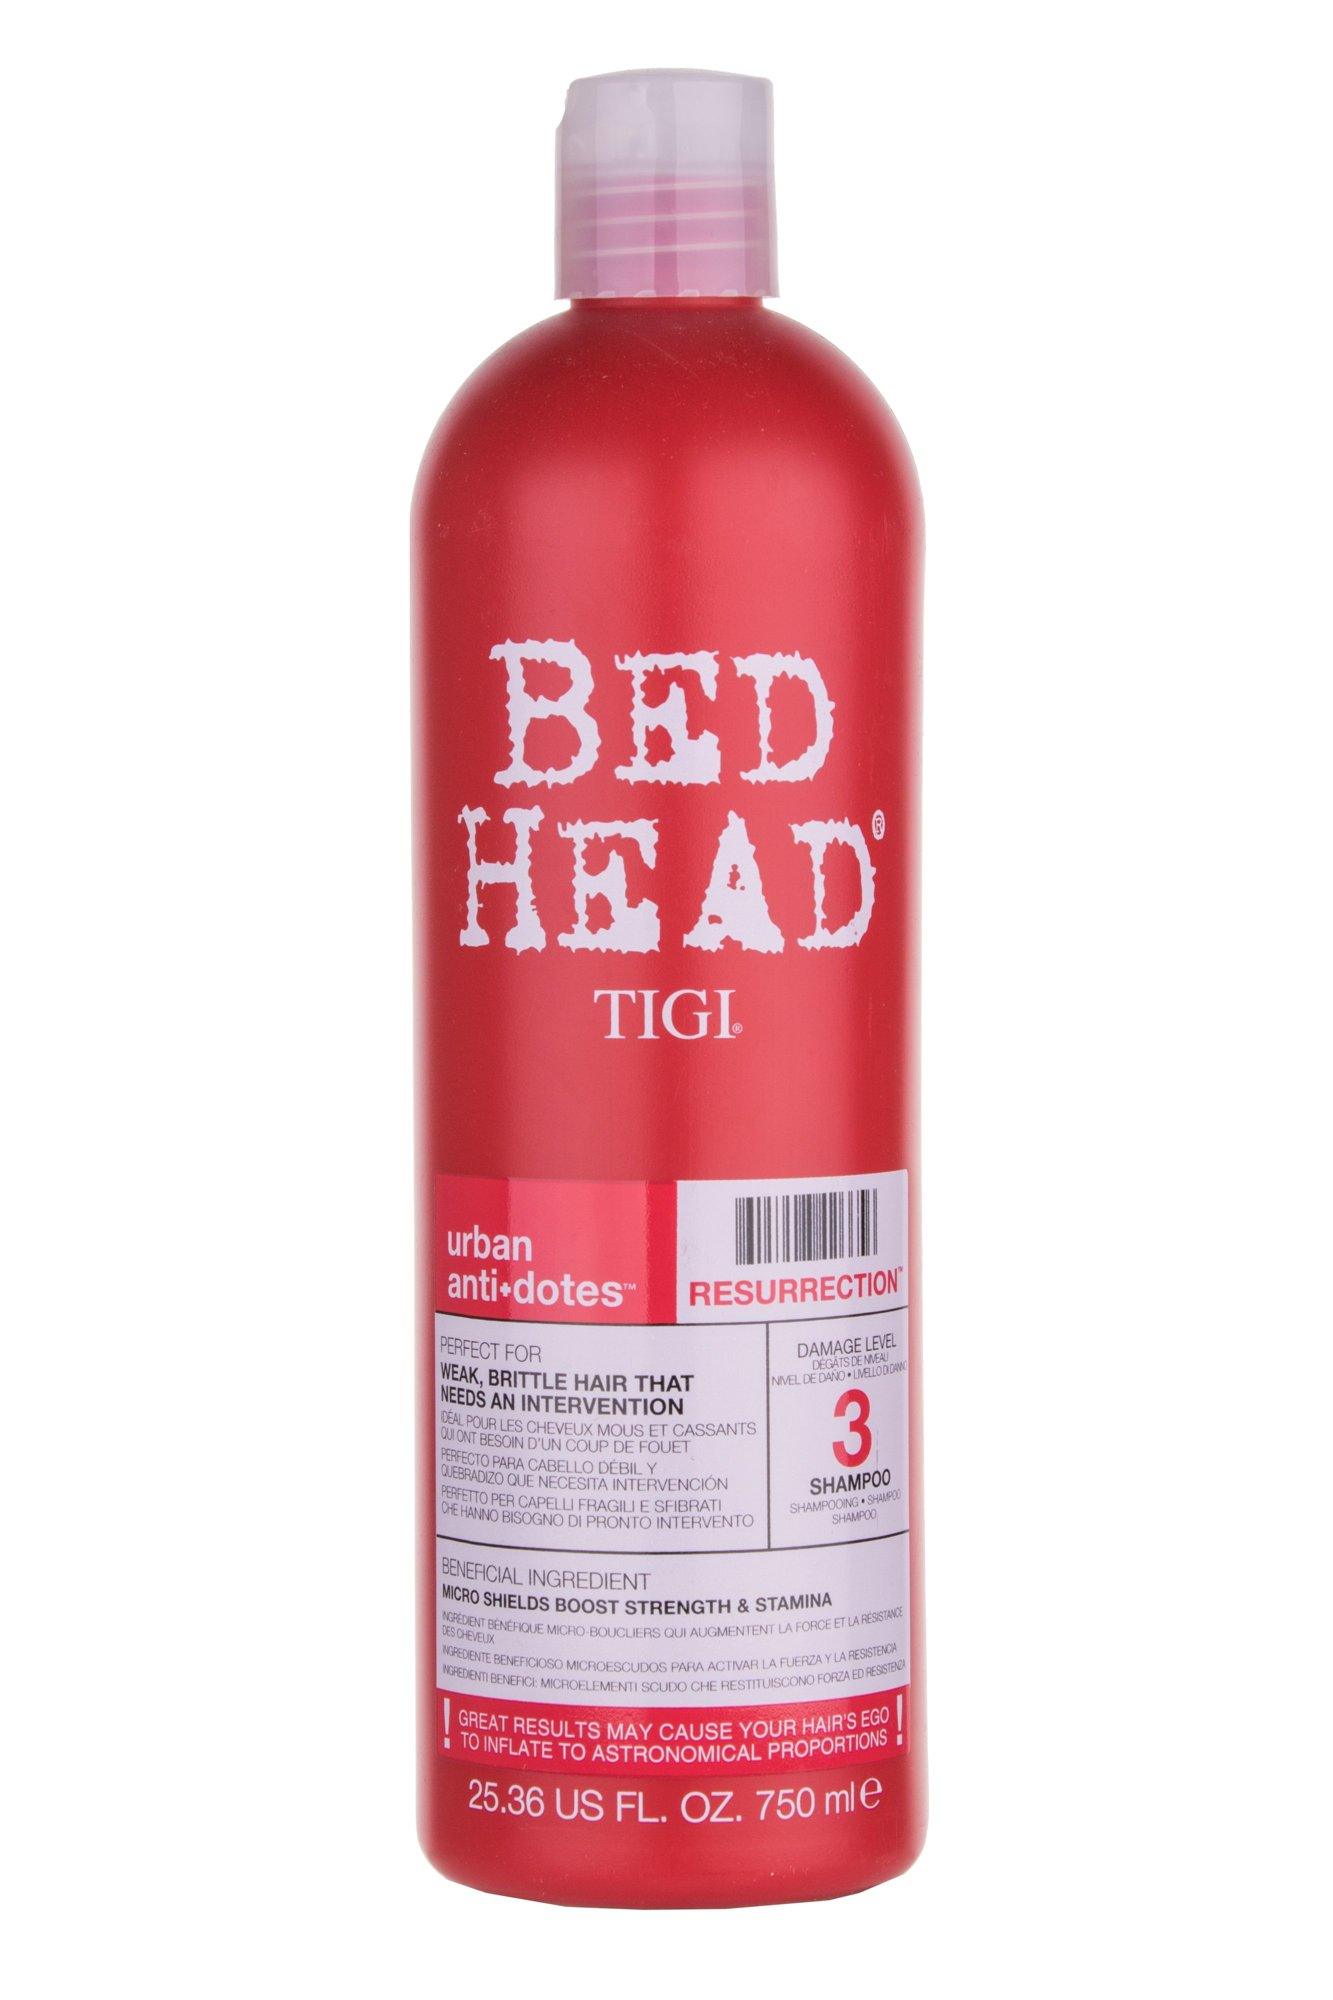 Tigi Bed Head Resurrection Cosmetic 750ml